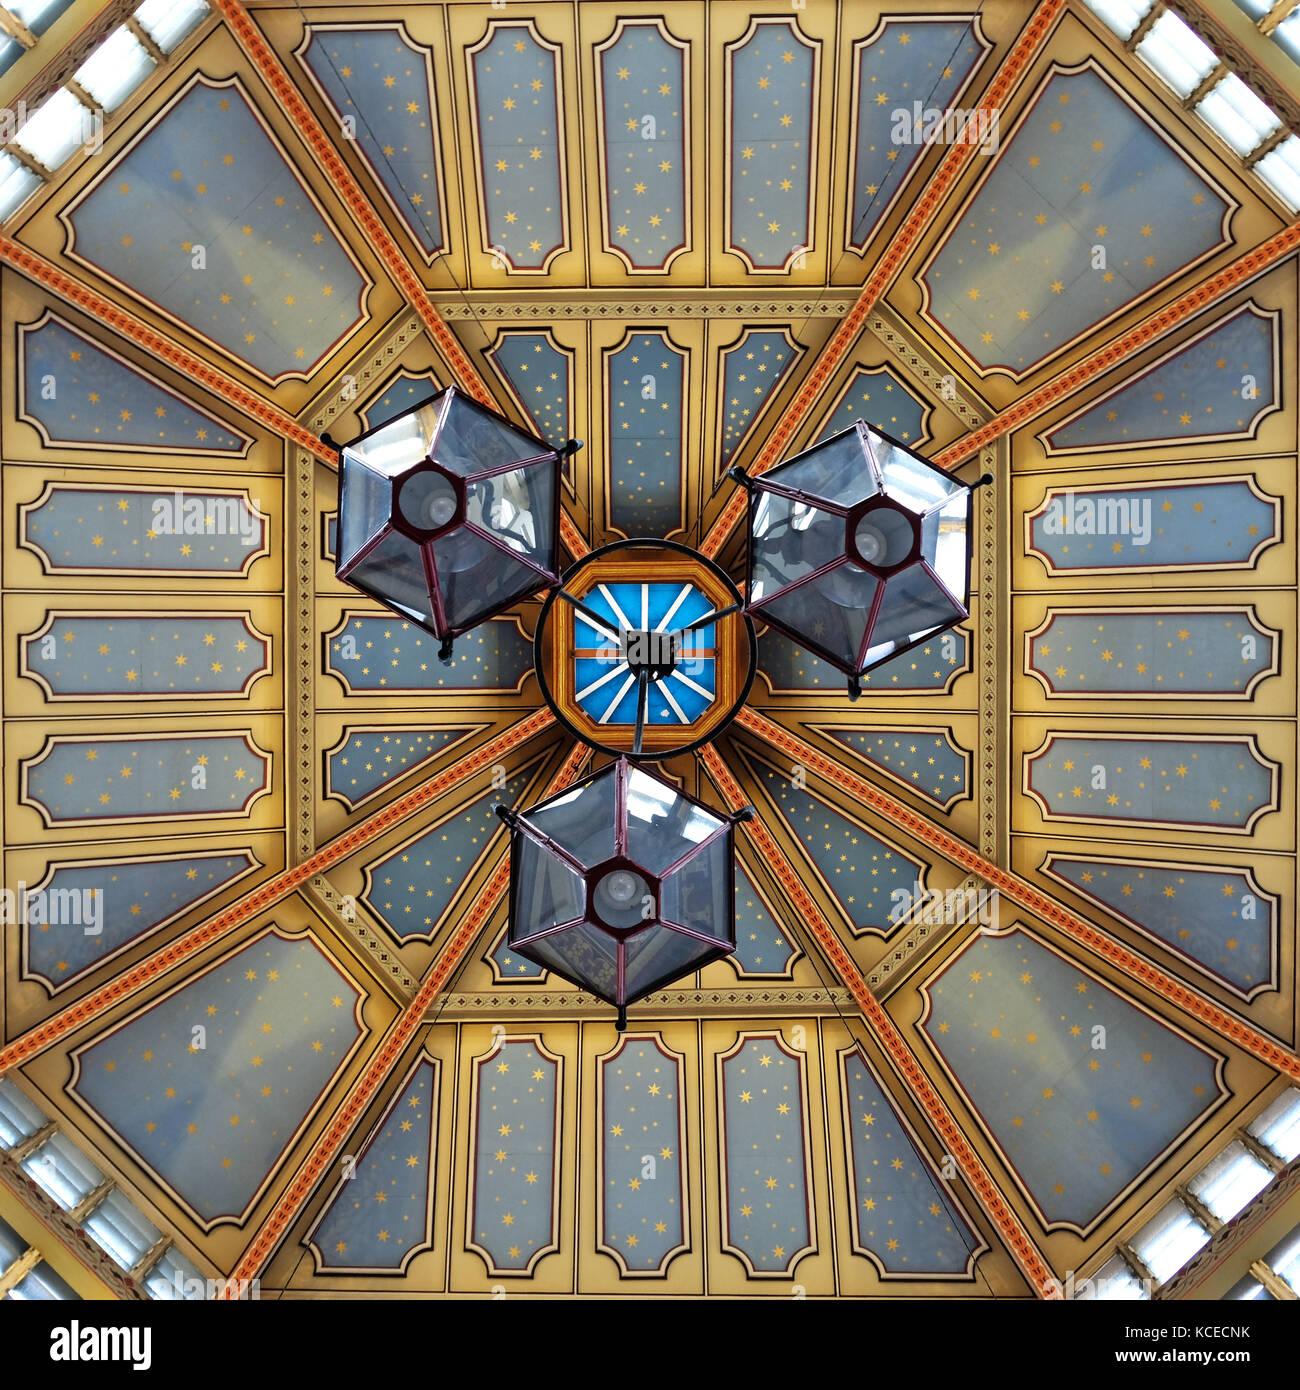 Der reich verzierte Dach im Leadenhall Market, Gracechurch Street, London. Stockbild